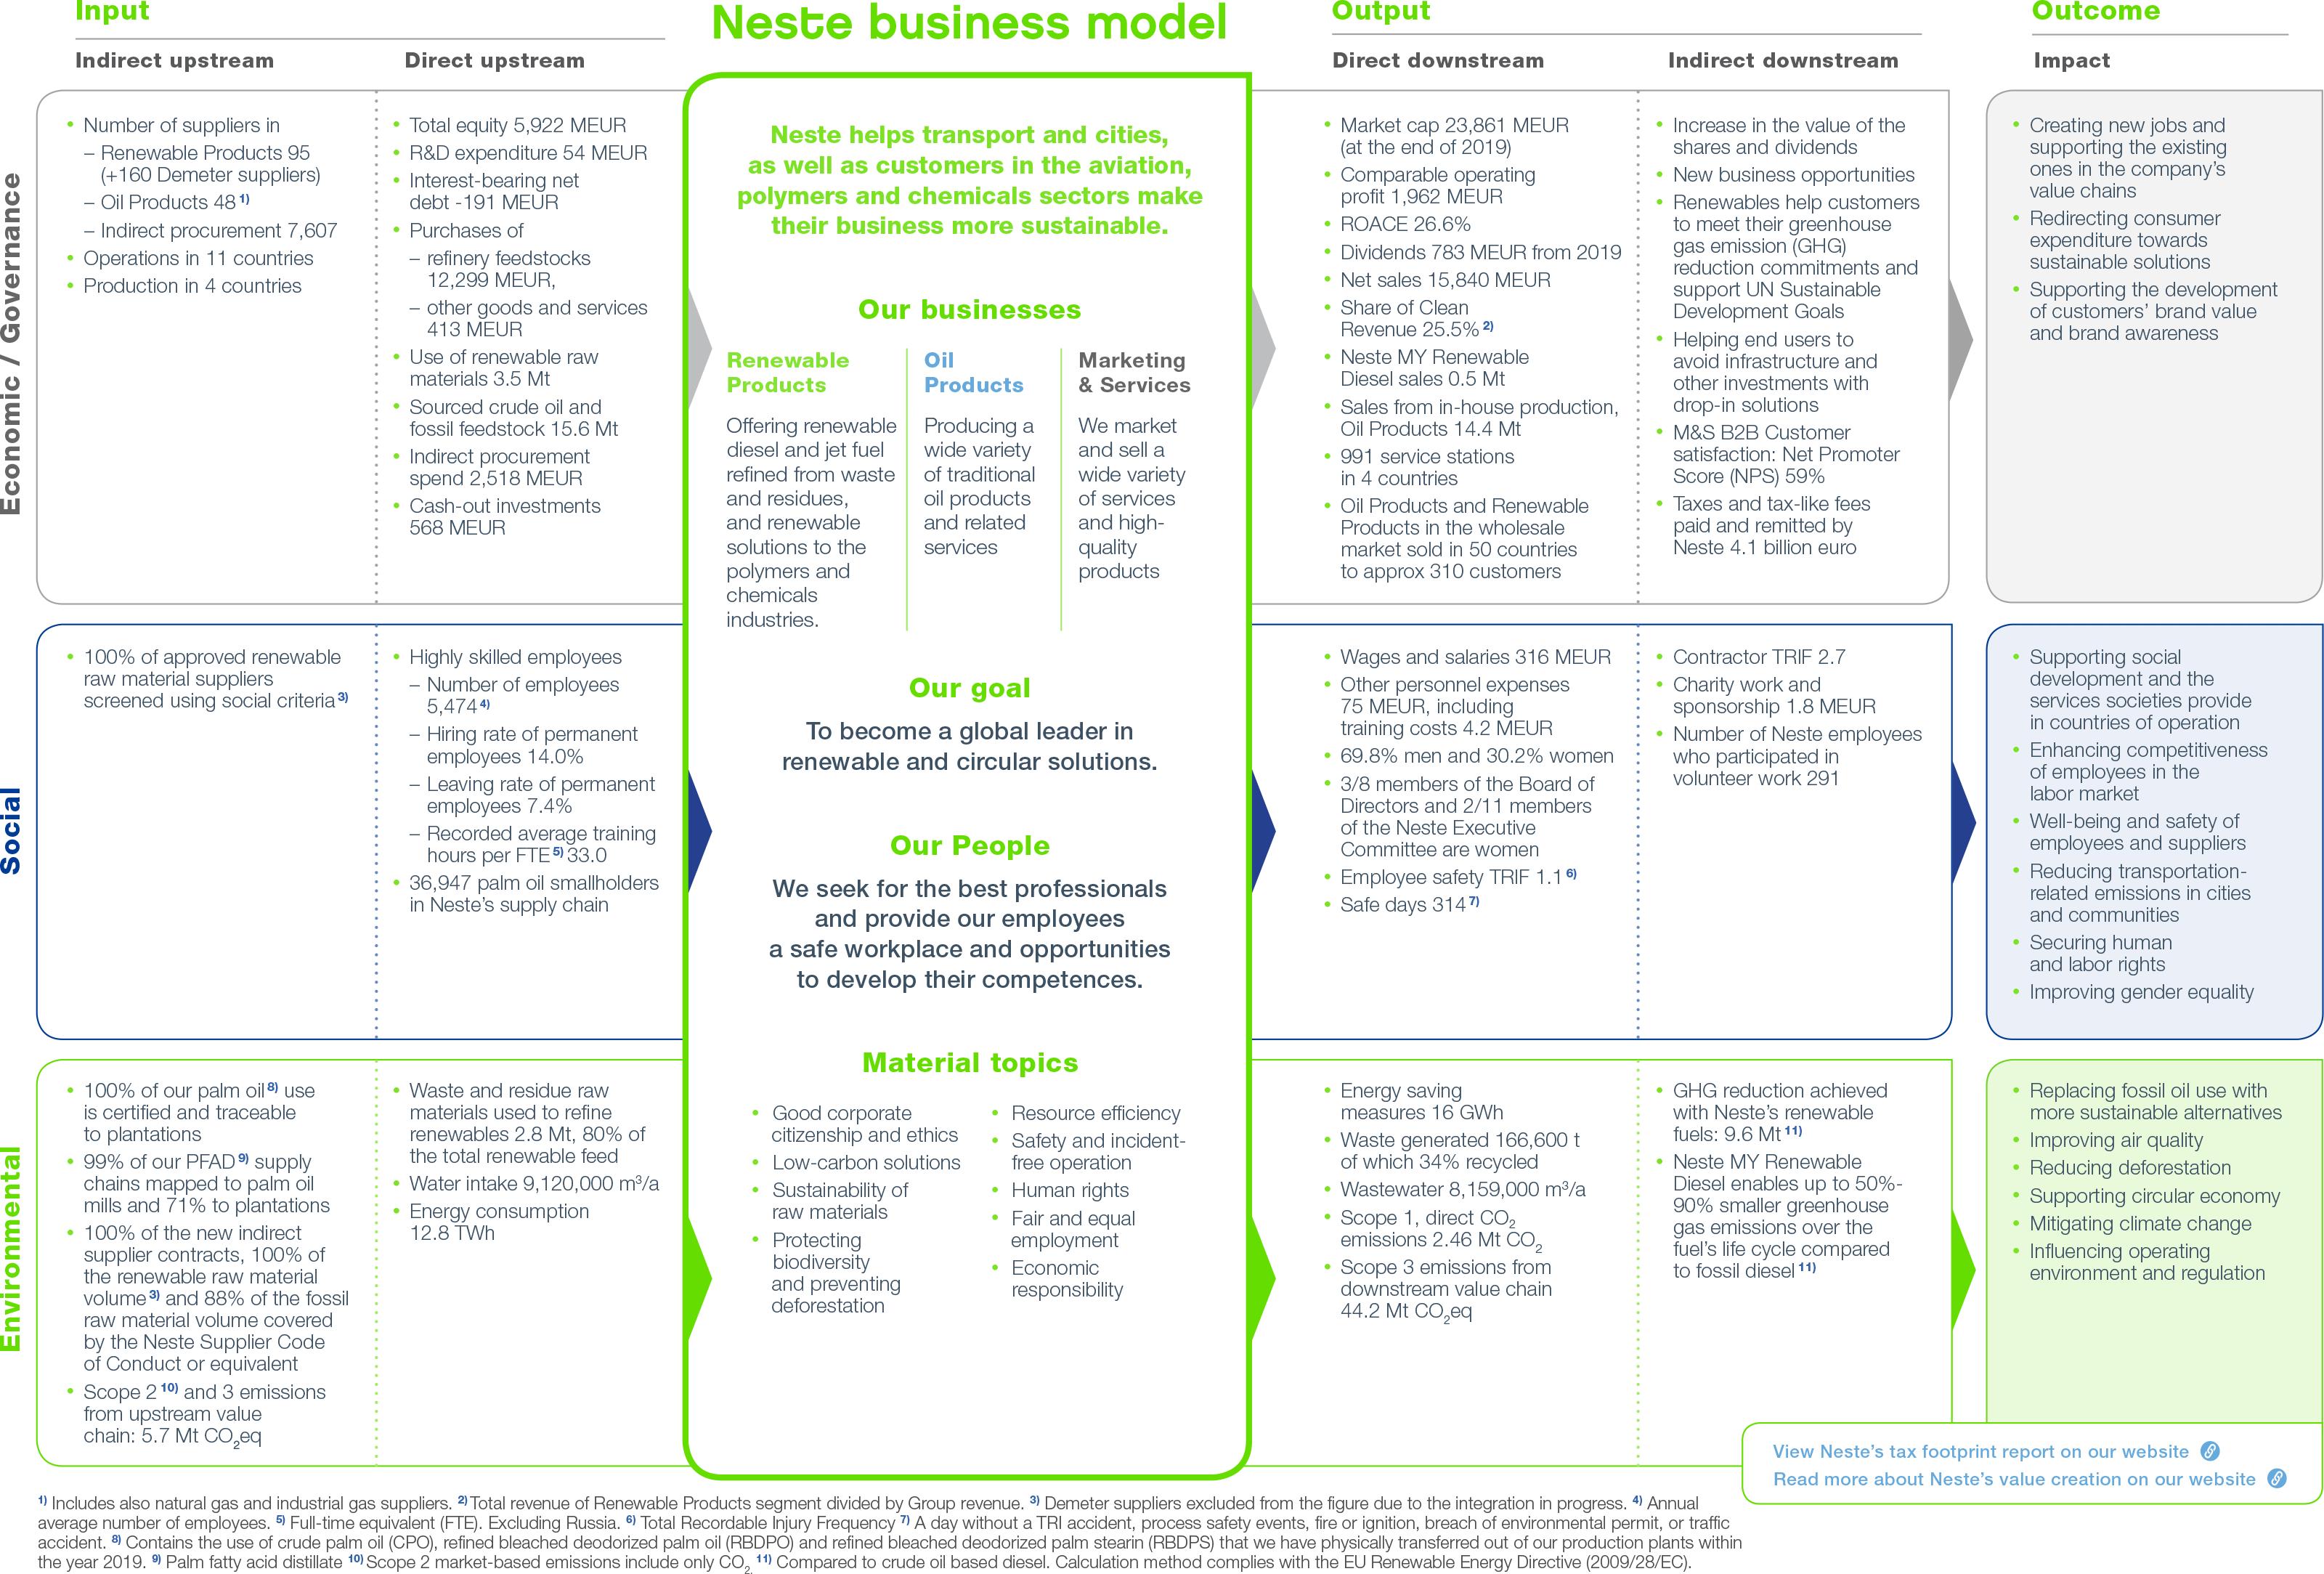 Nestes value creation